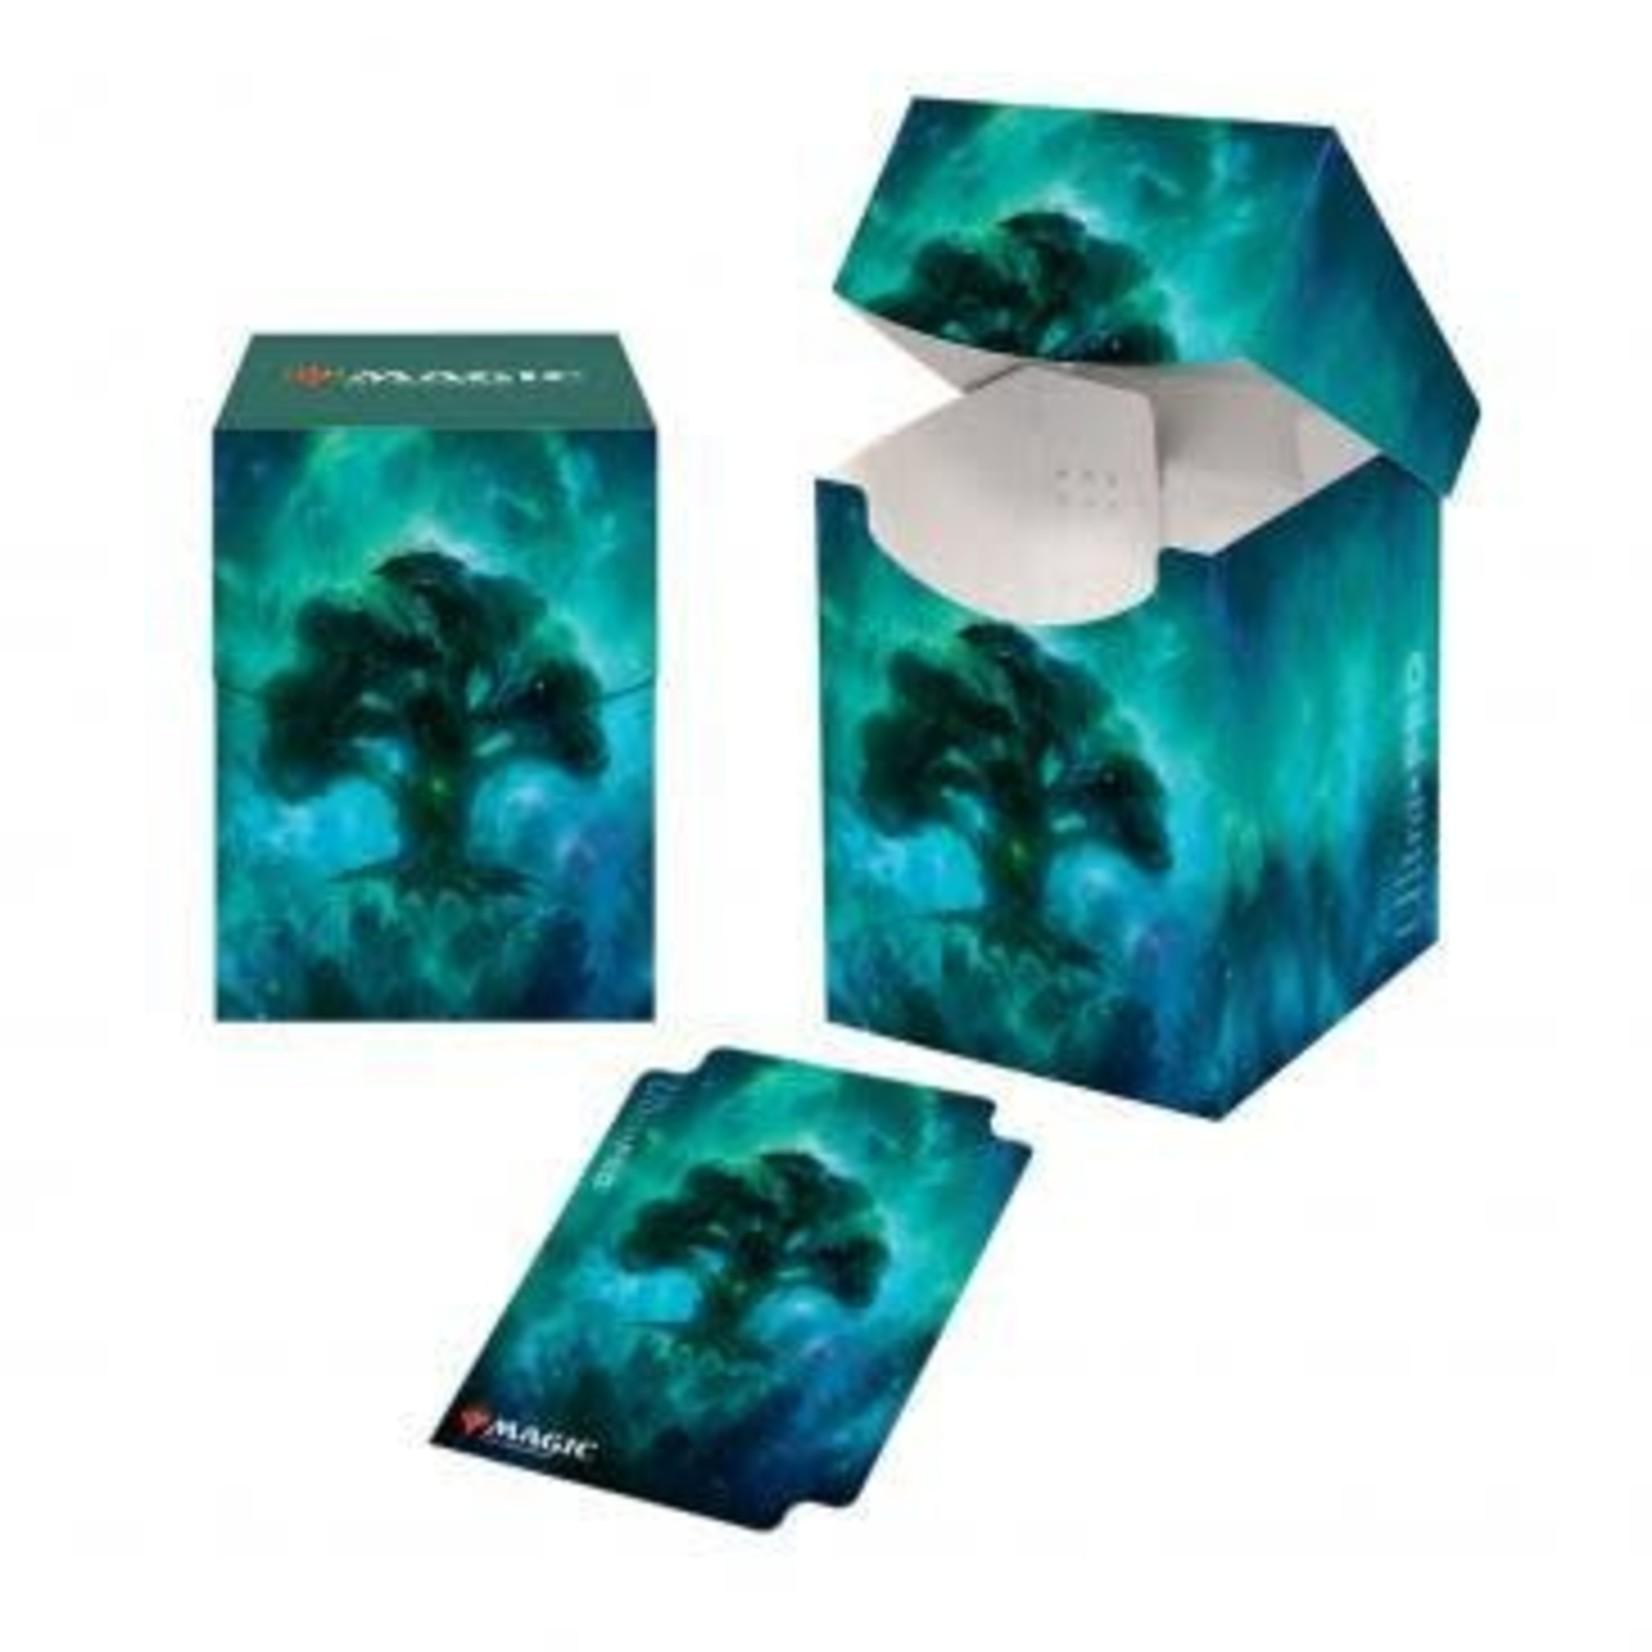 MTG Celestial Land Deck Box - Green